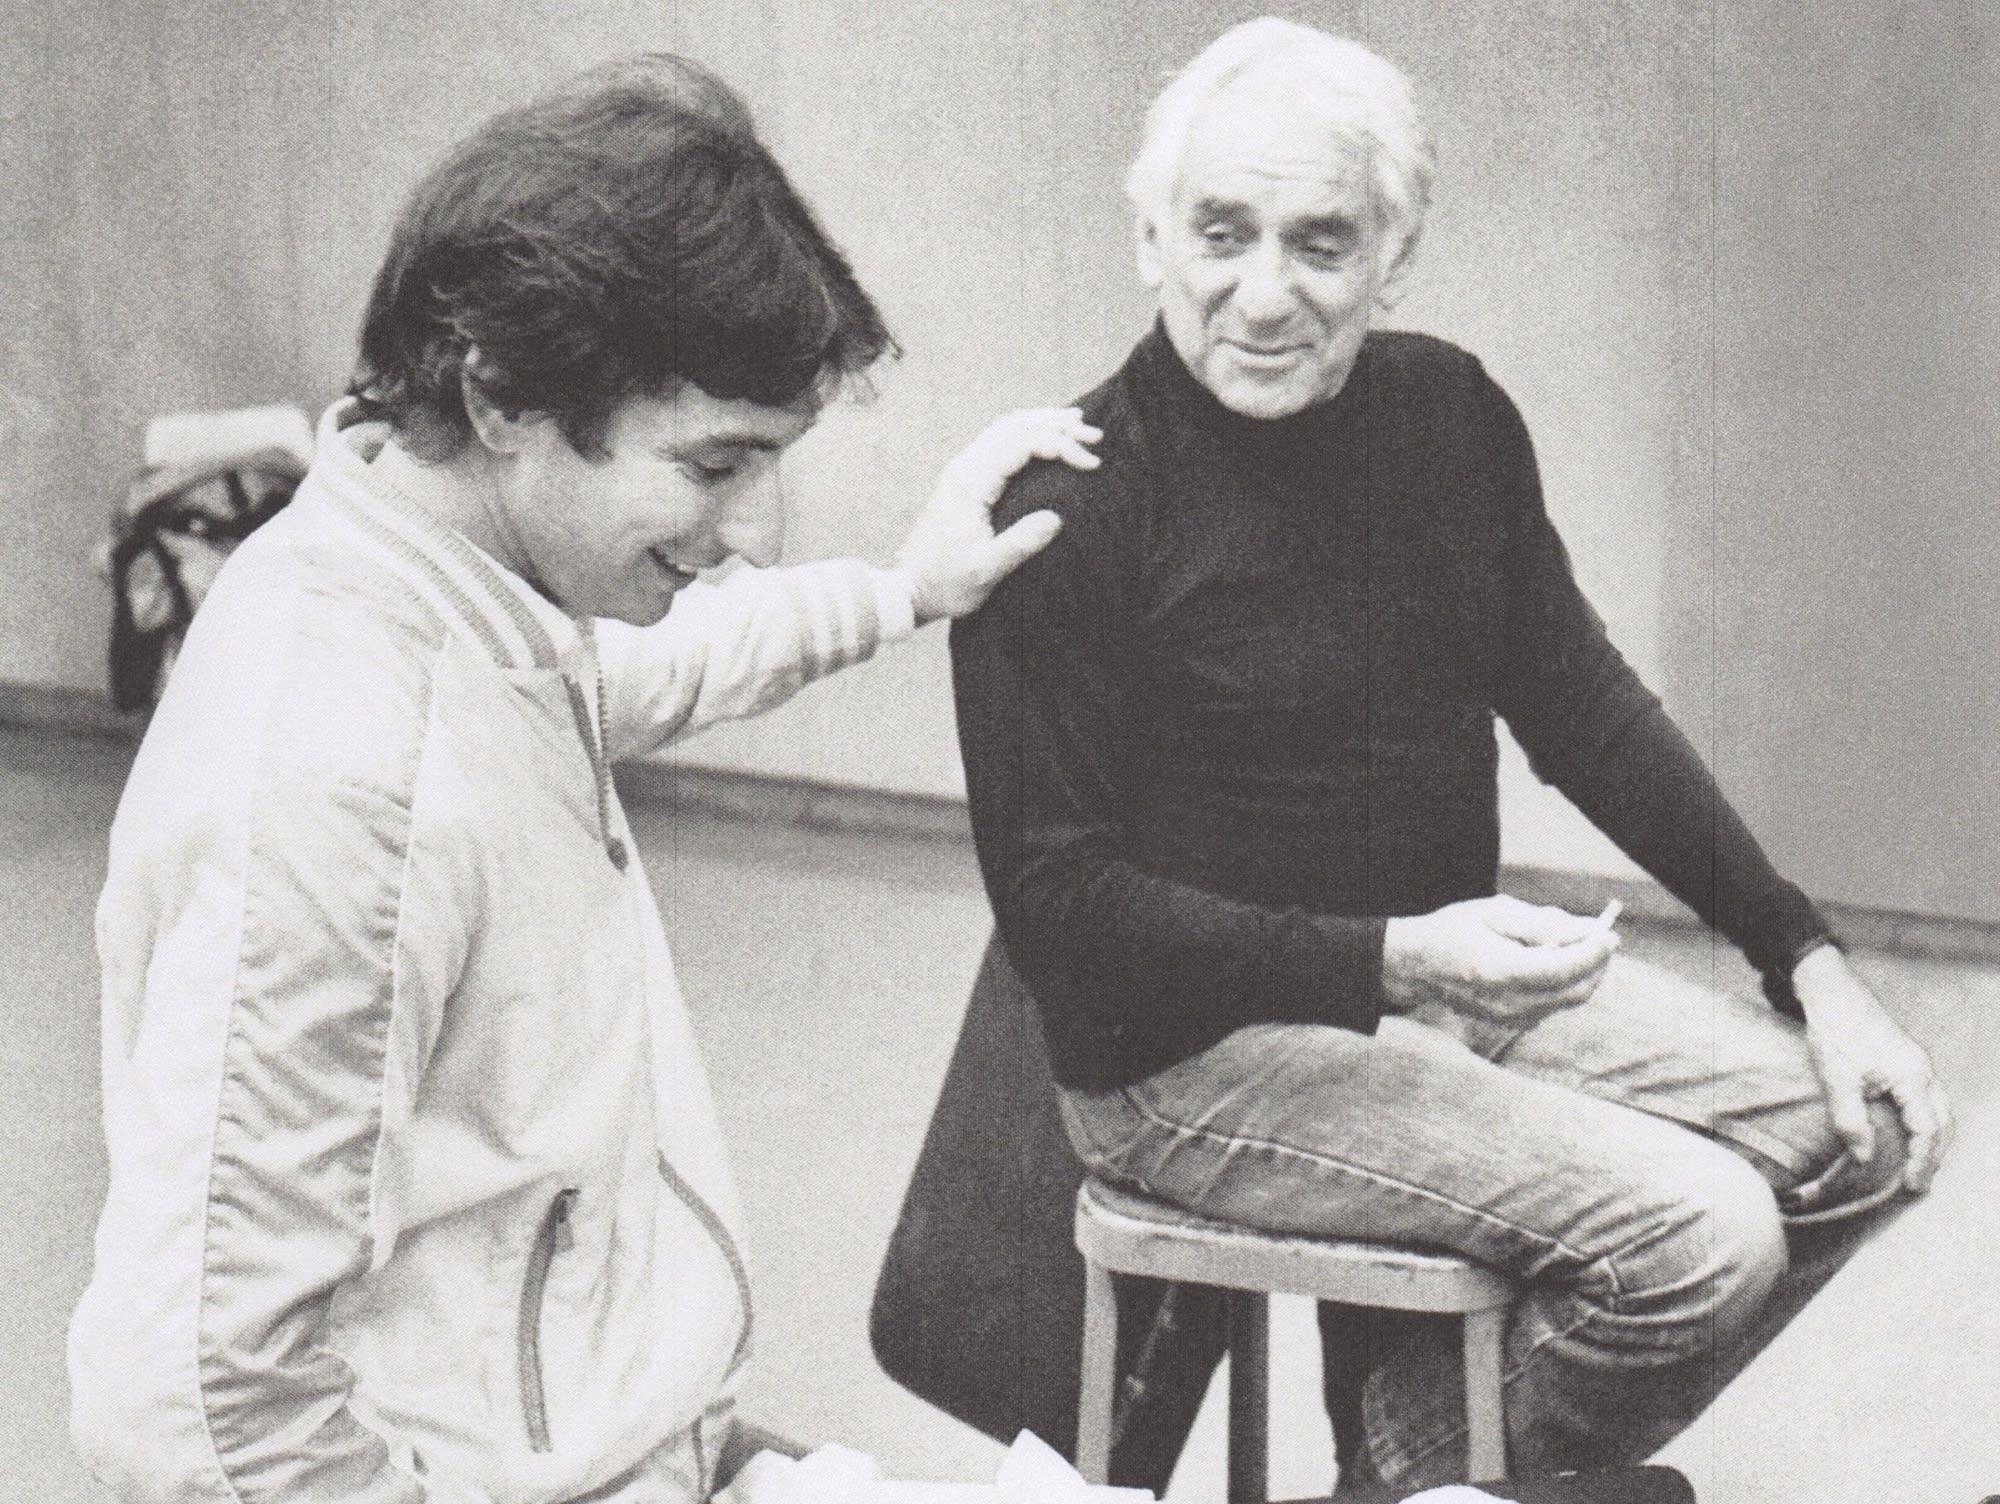 Michael Tilson Thomas and Leonard Bernstein